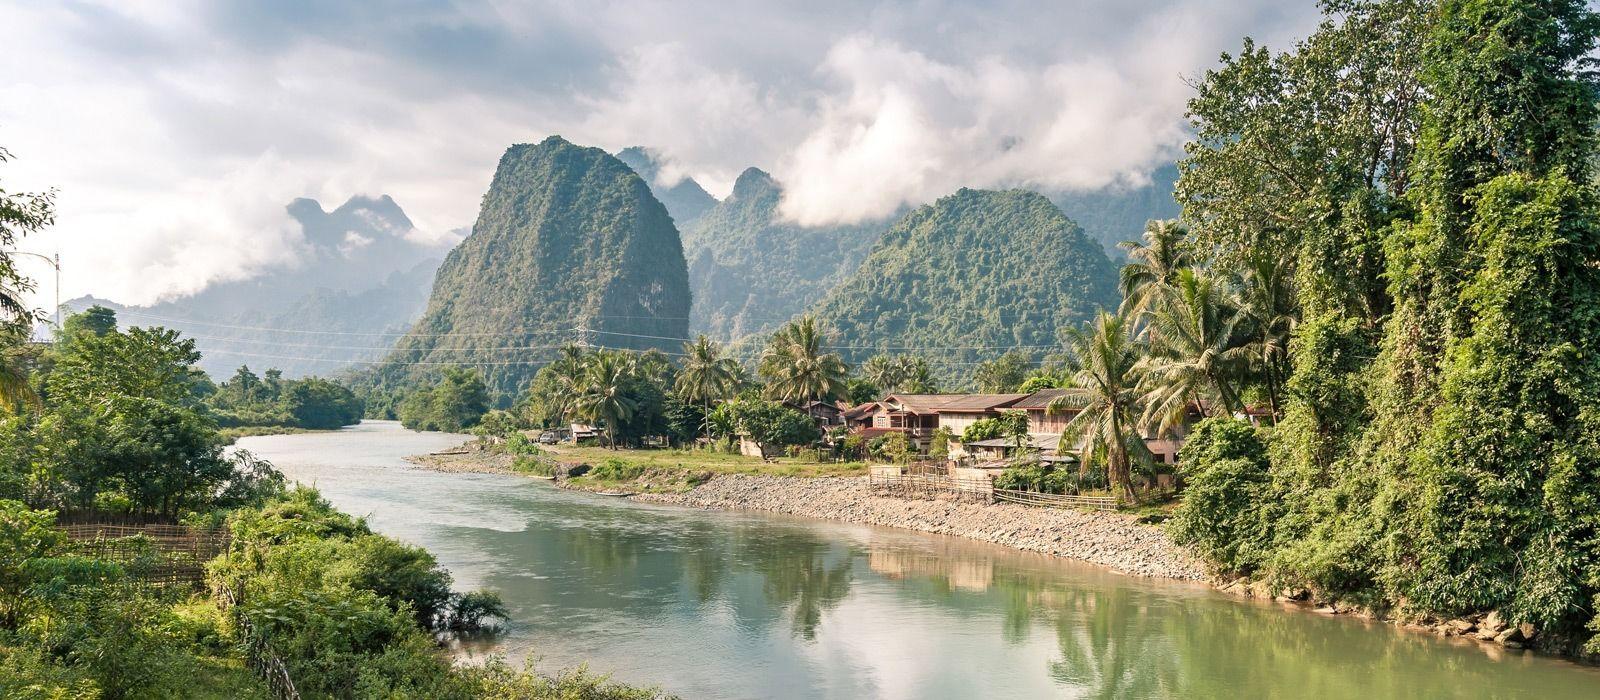 exclusive travel tips for luang prabang mekong